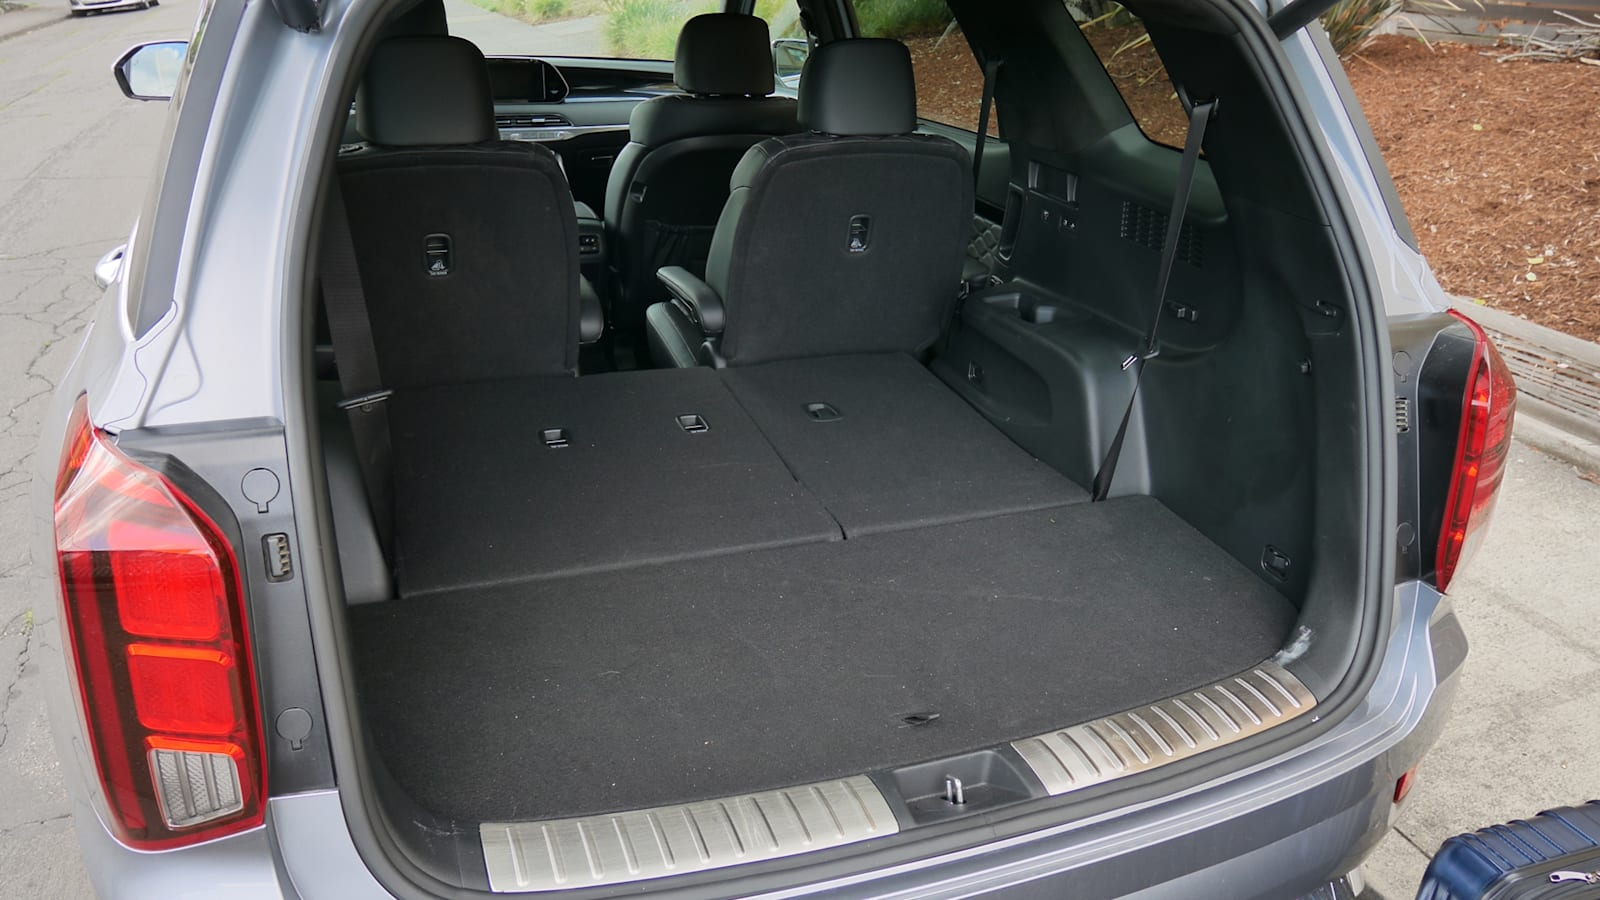 2020 Hyundai Palisade | How much fits behind the third row?